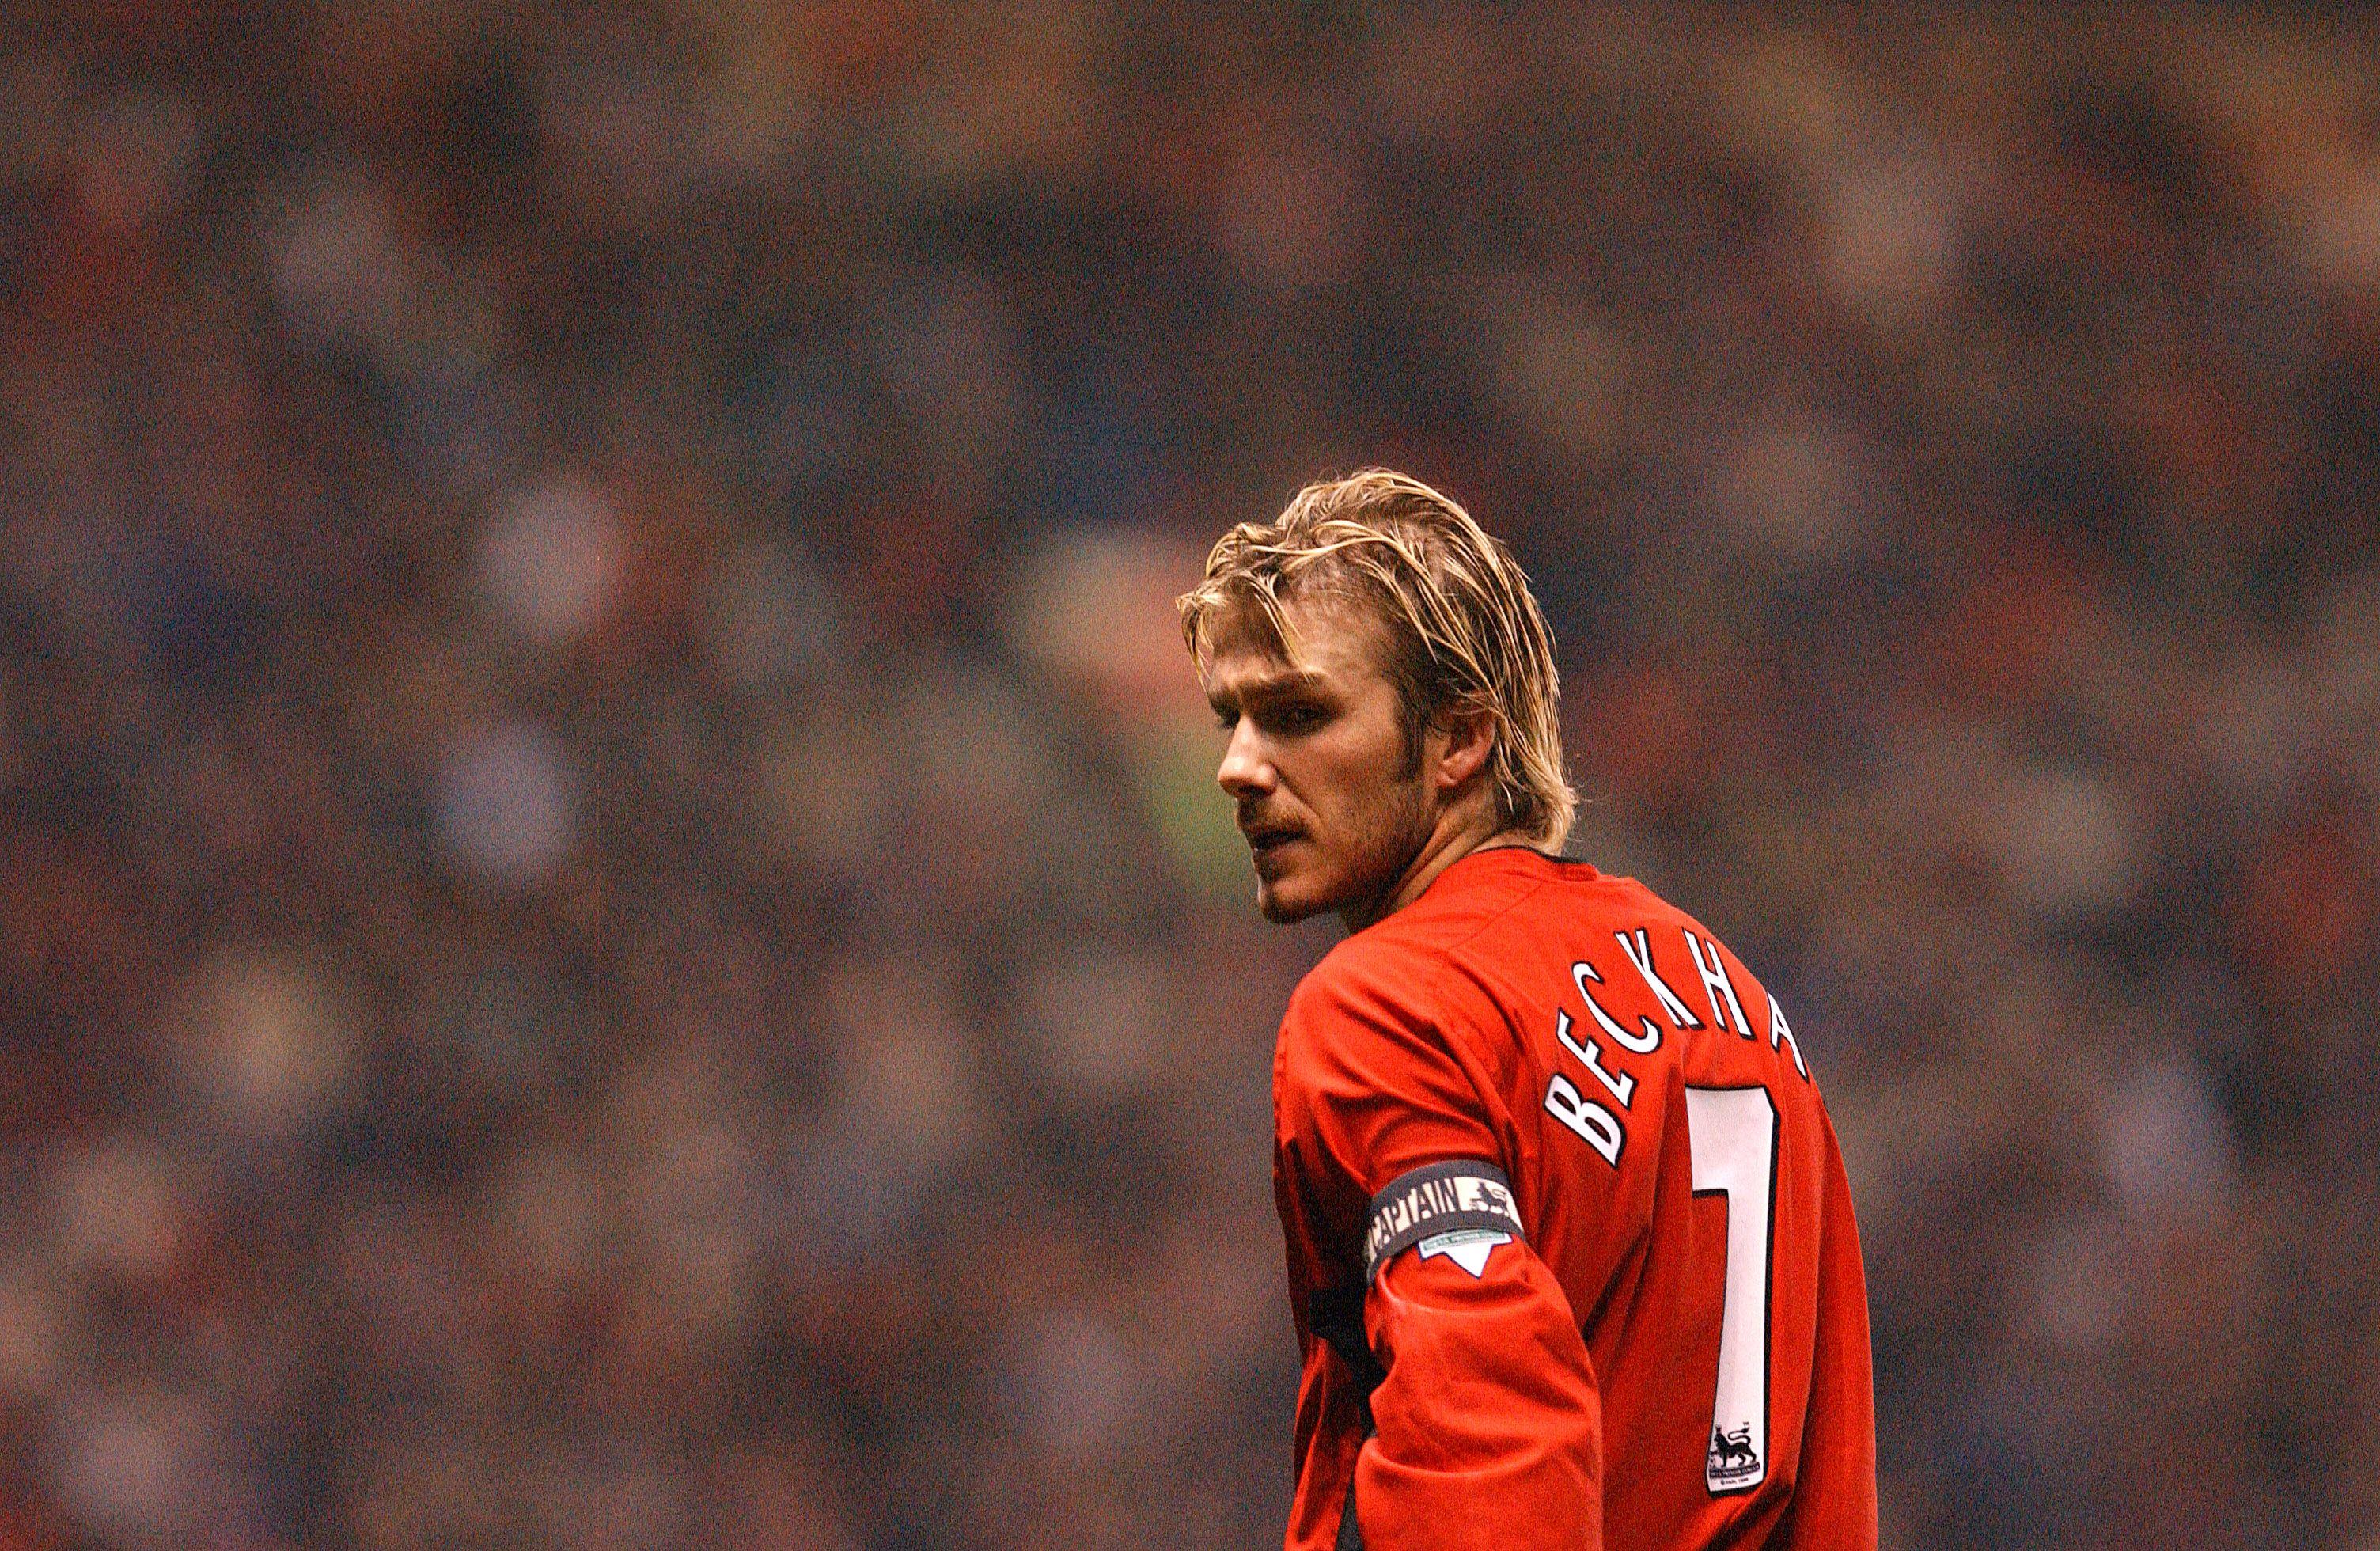 Manutd Legend David Beckham David Beckham Manchester United